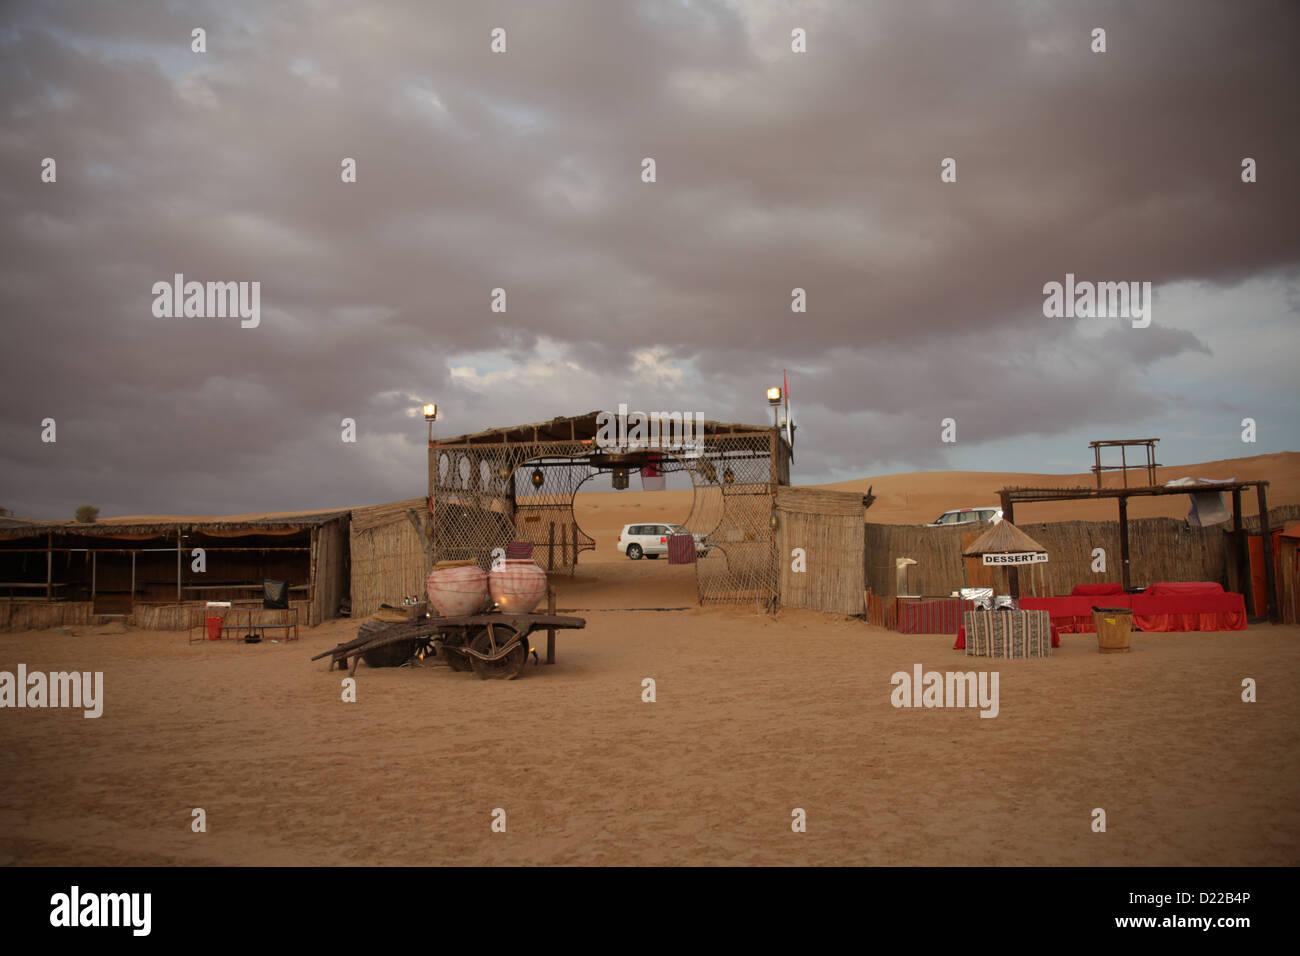 outdoor shot of desert - Stock Image